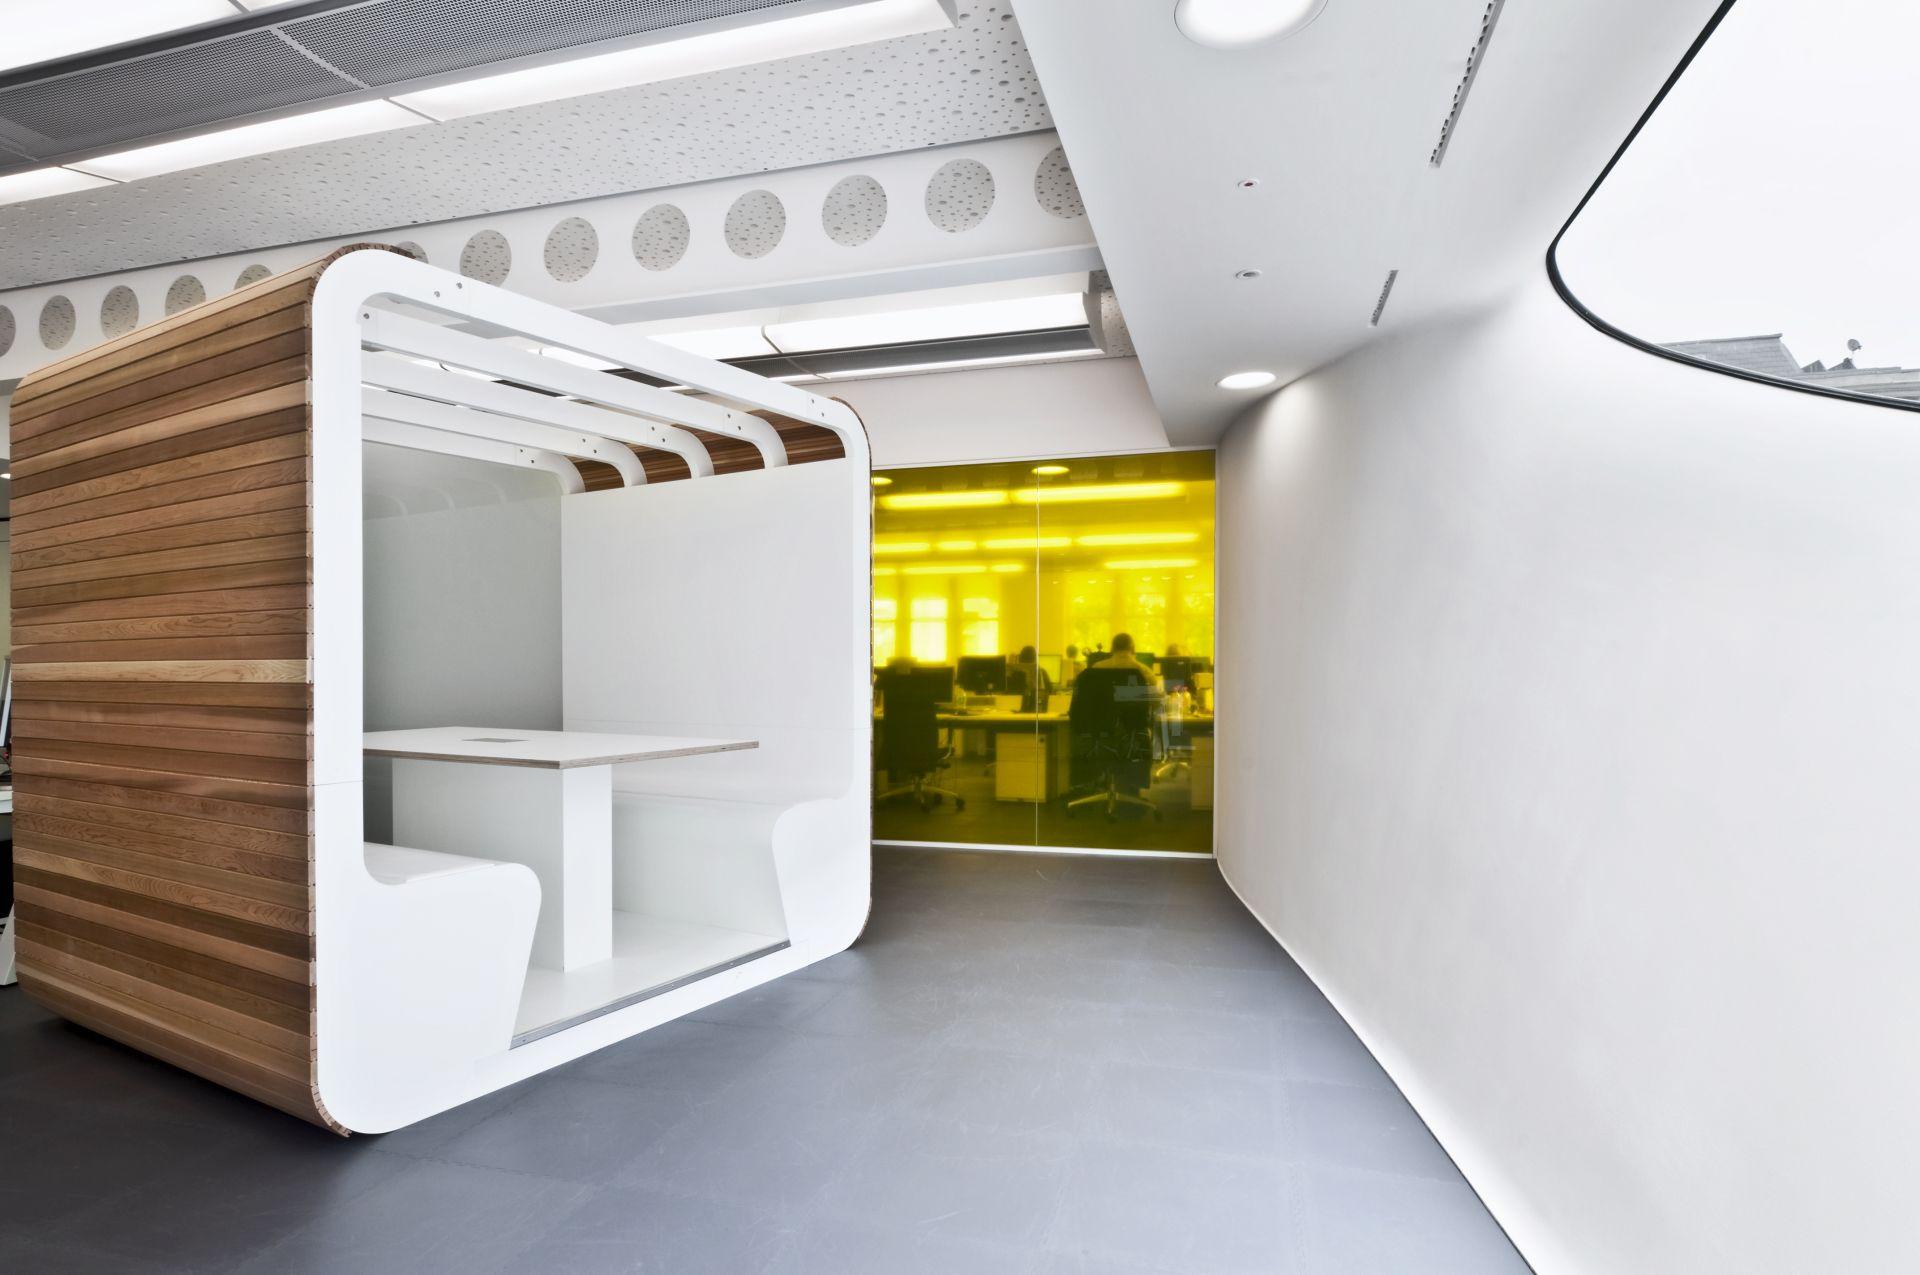 ergonomic office design. Dentsu Case Study Image Ergonomic Office Design I